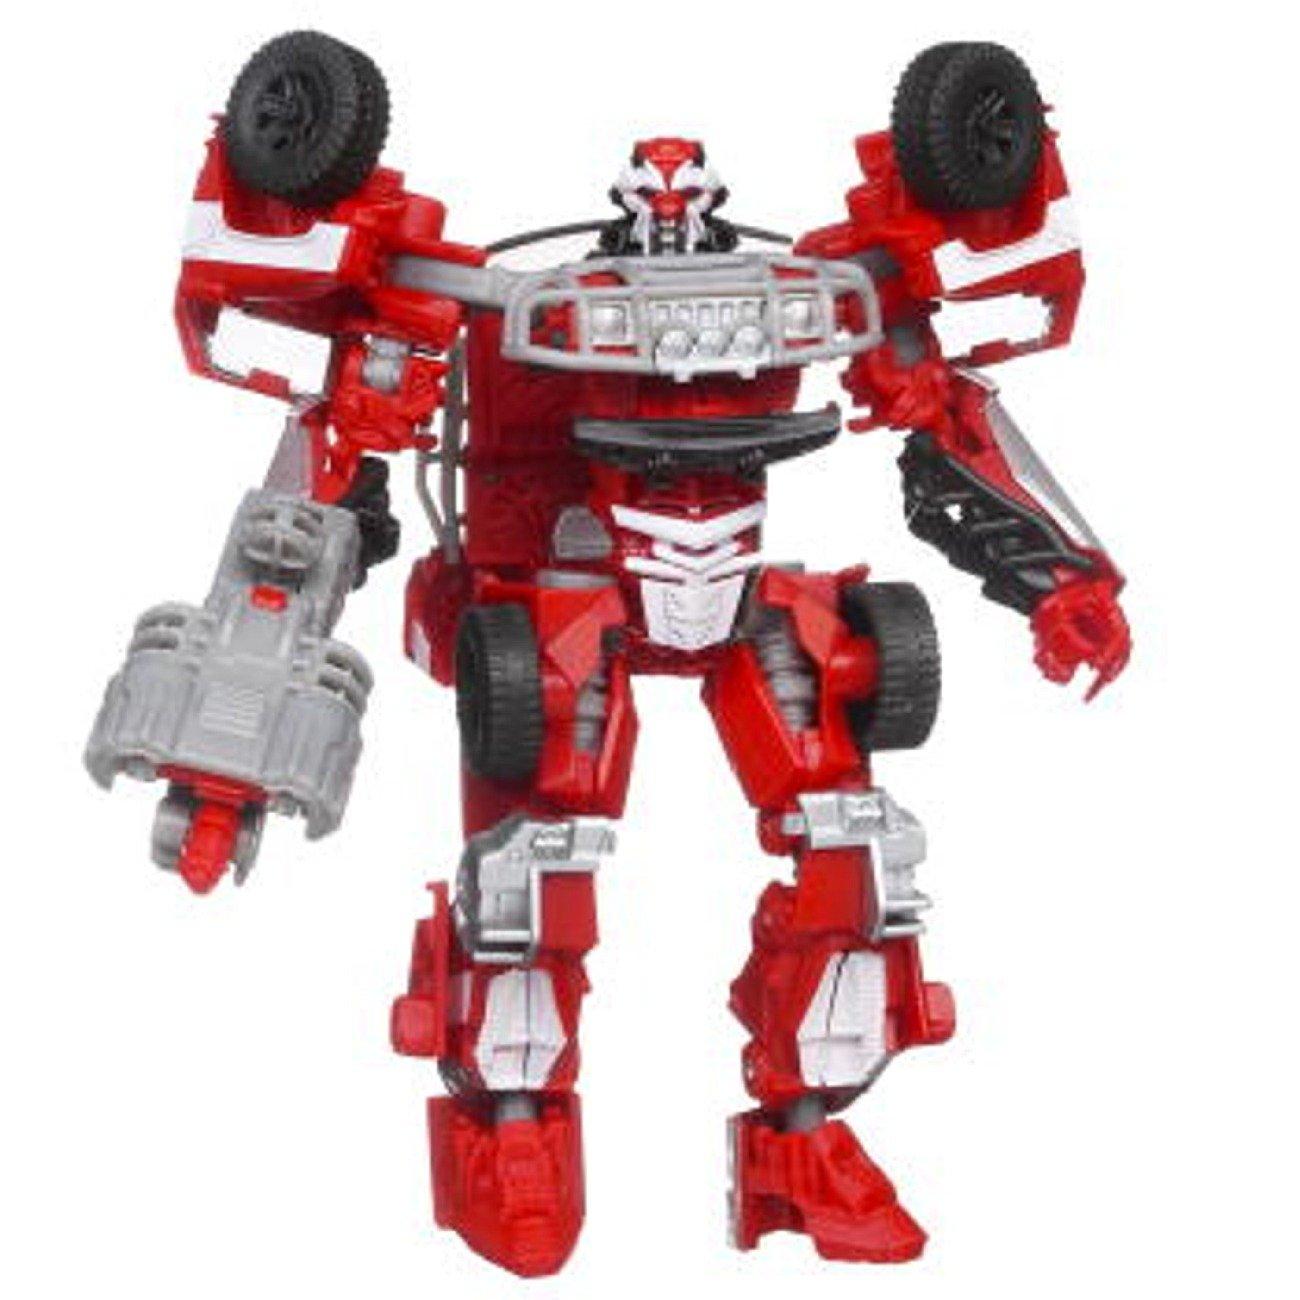 Transformers 3 Dark of the Moon Movie Deluxe Class Figure Specialist Ratchet 32365